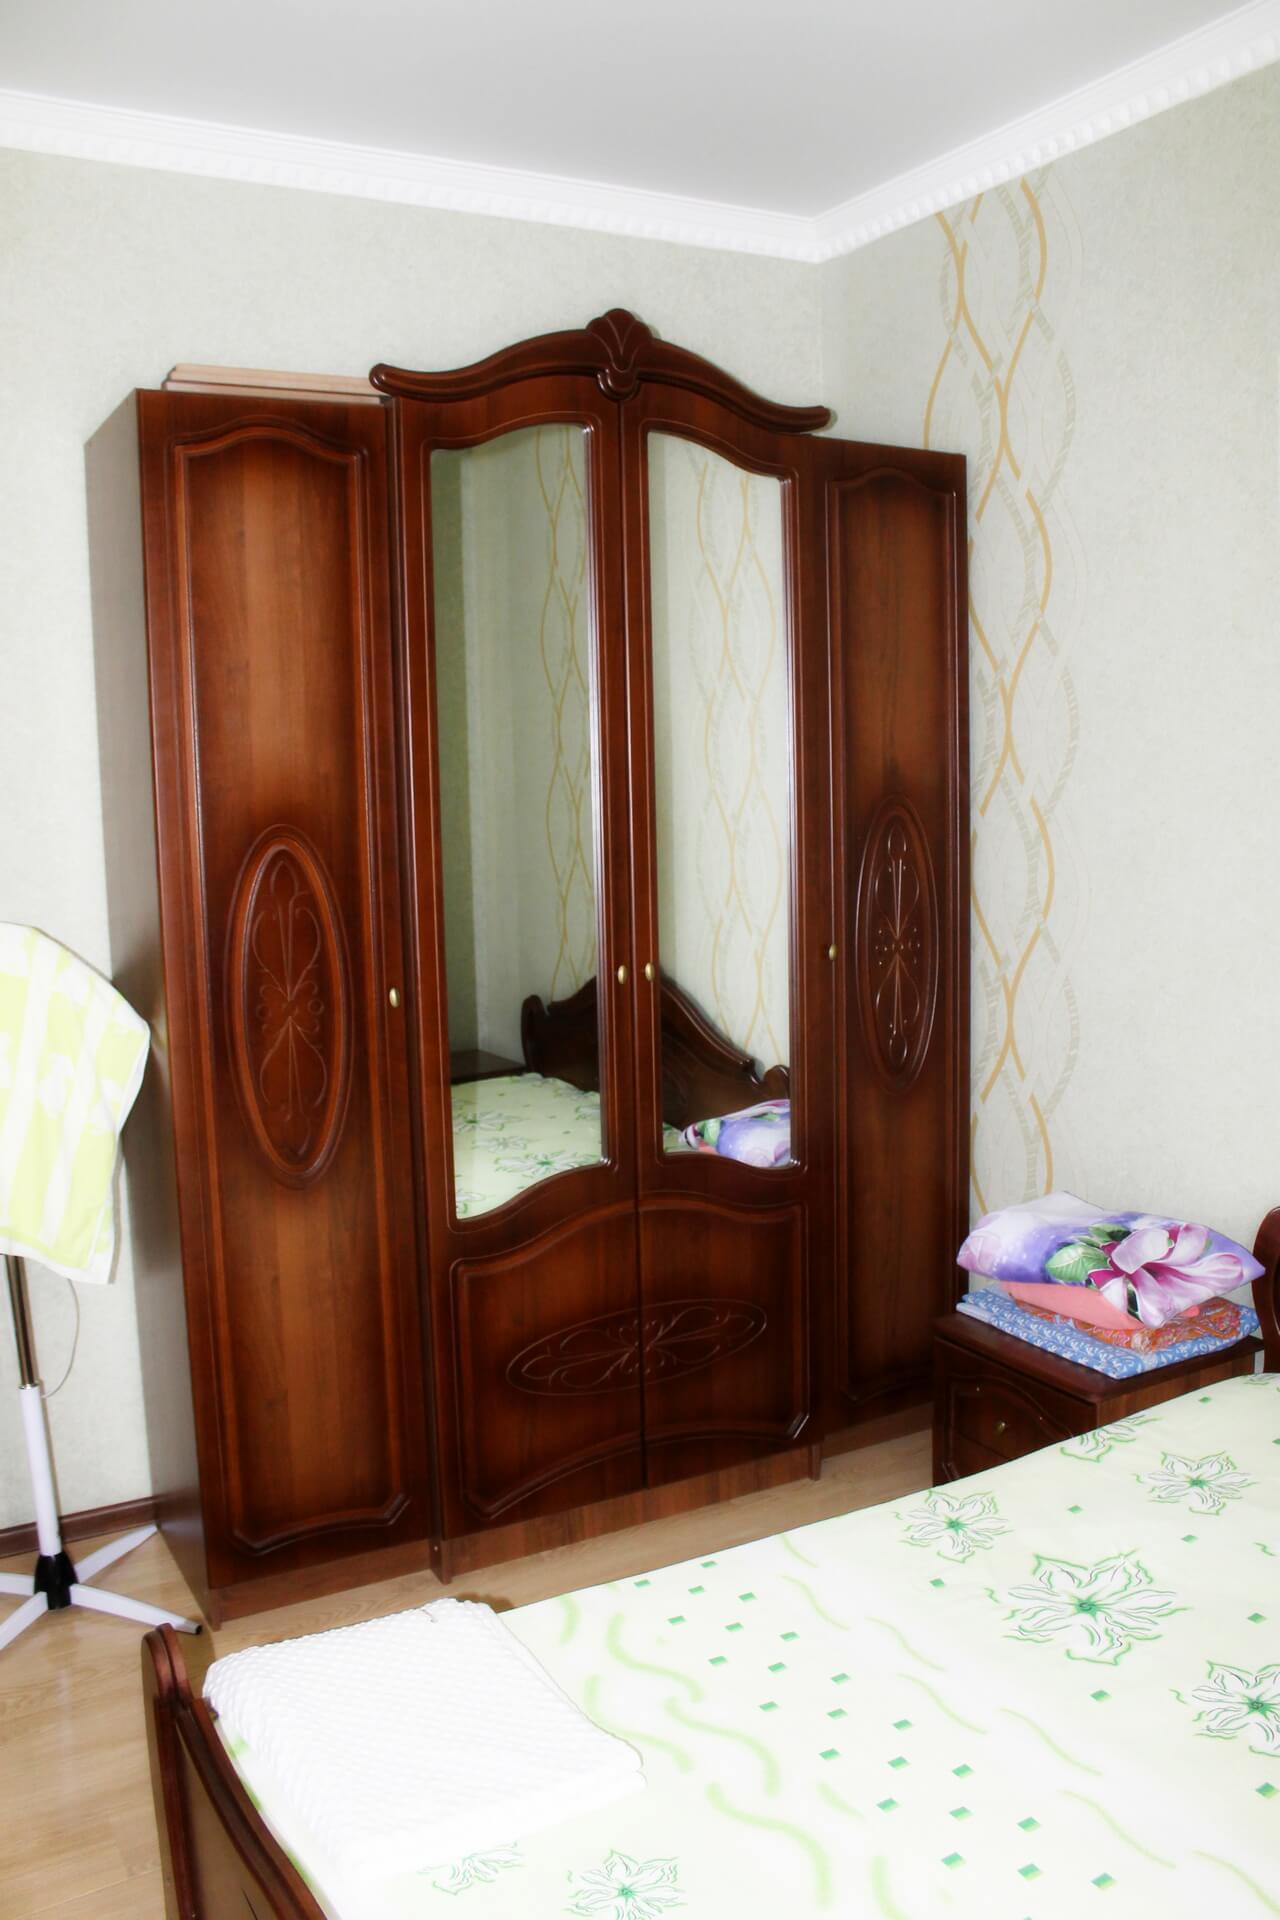 Гостевой дом на улице Веселая - image Gostevoj-dom-v-Adlere-7 on http://bizneskvartal.ru